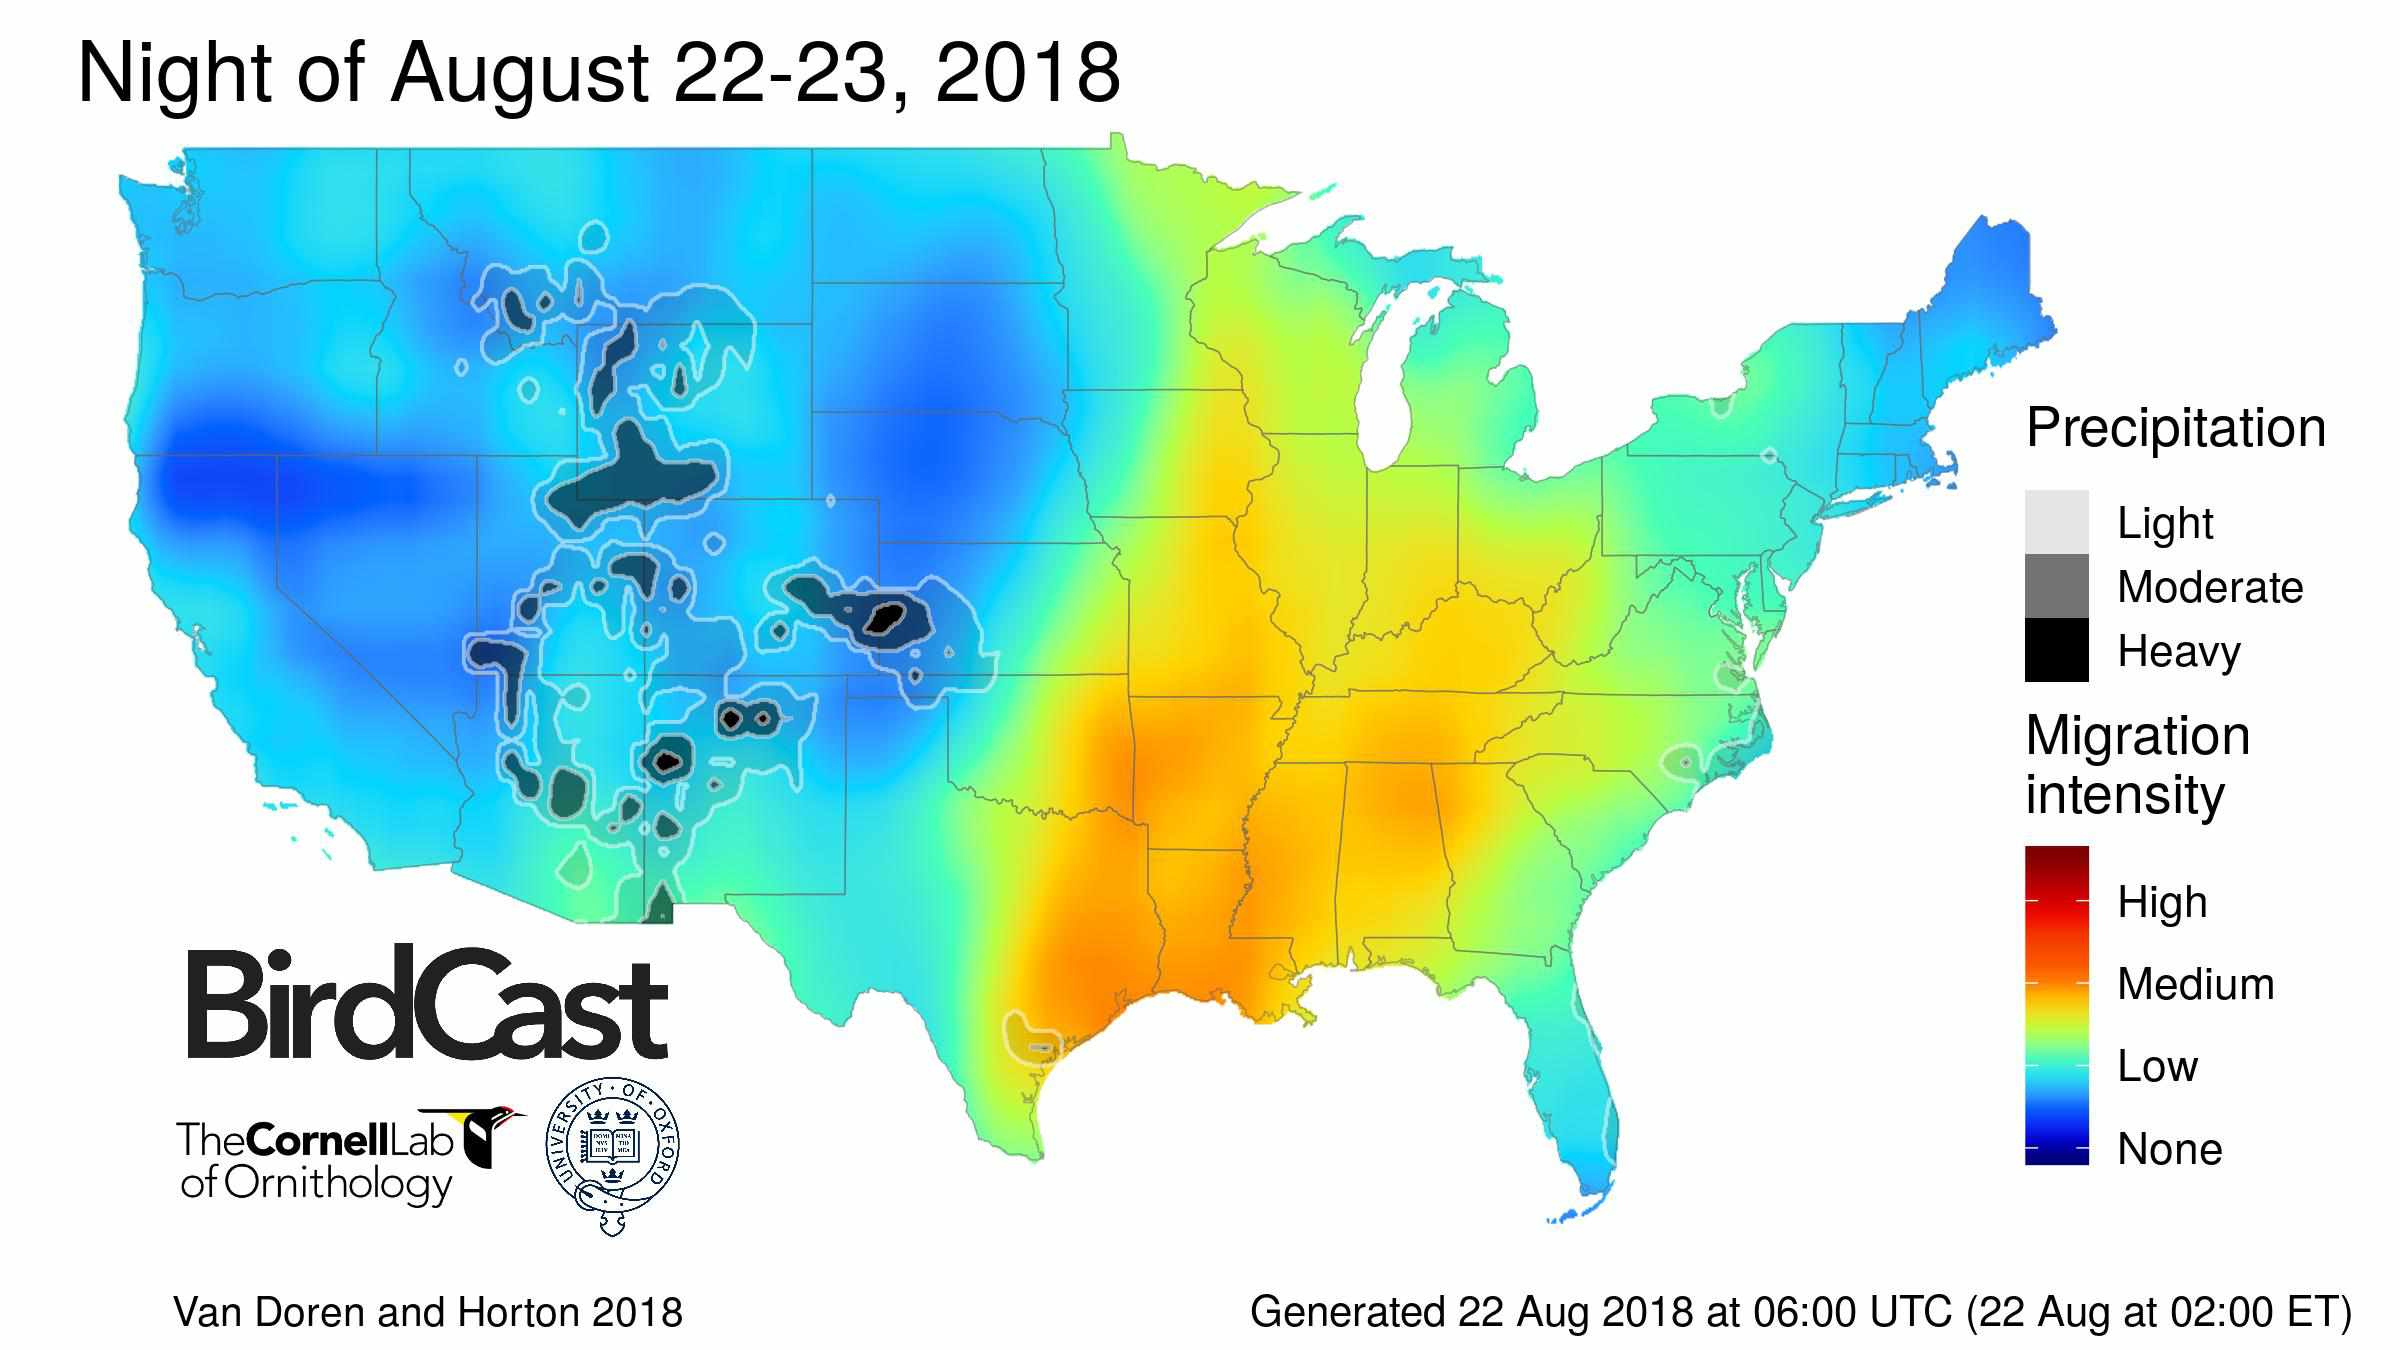 birdcast forecast map